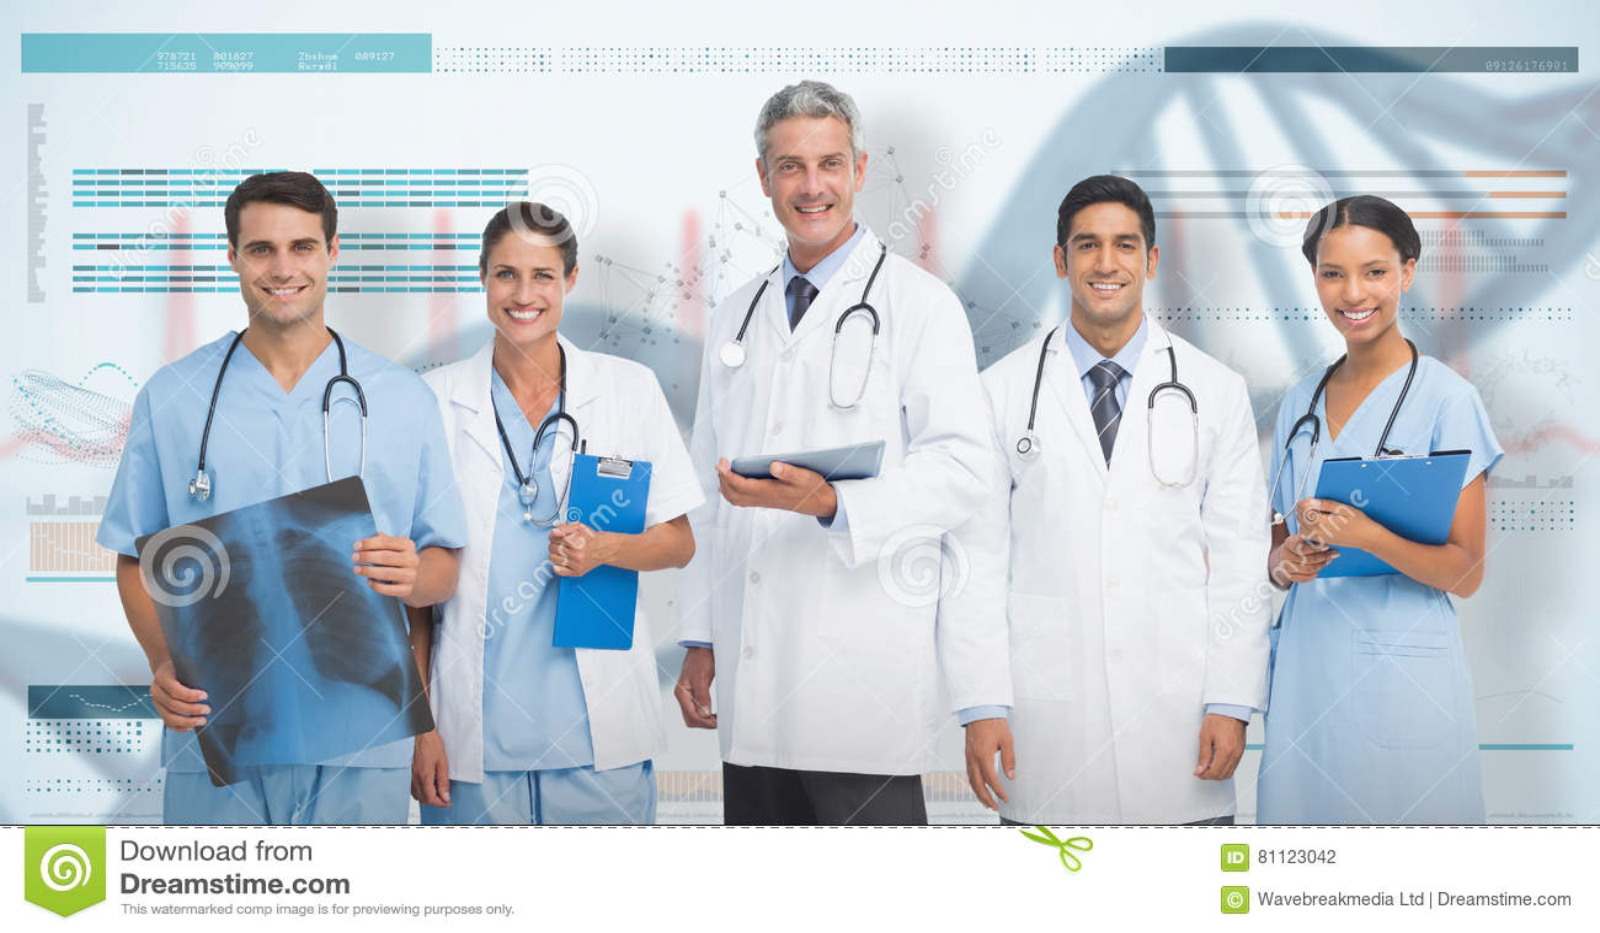 3D Composite image of portrait of confident medical team